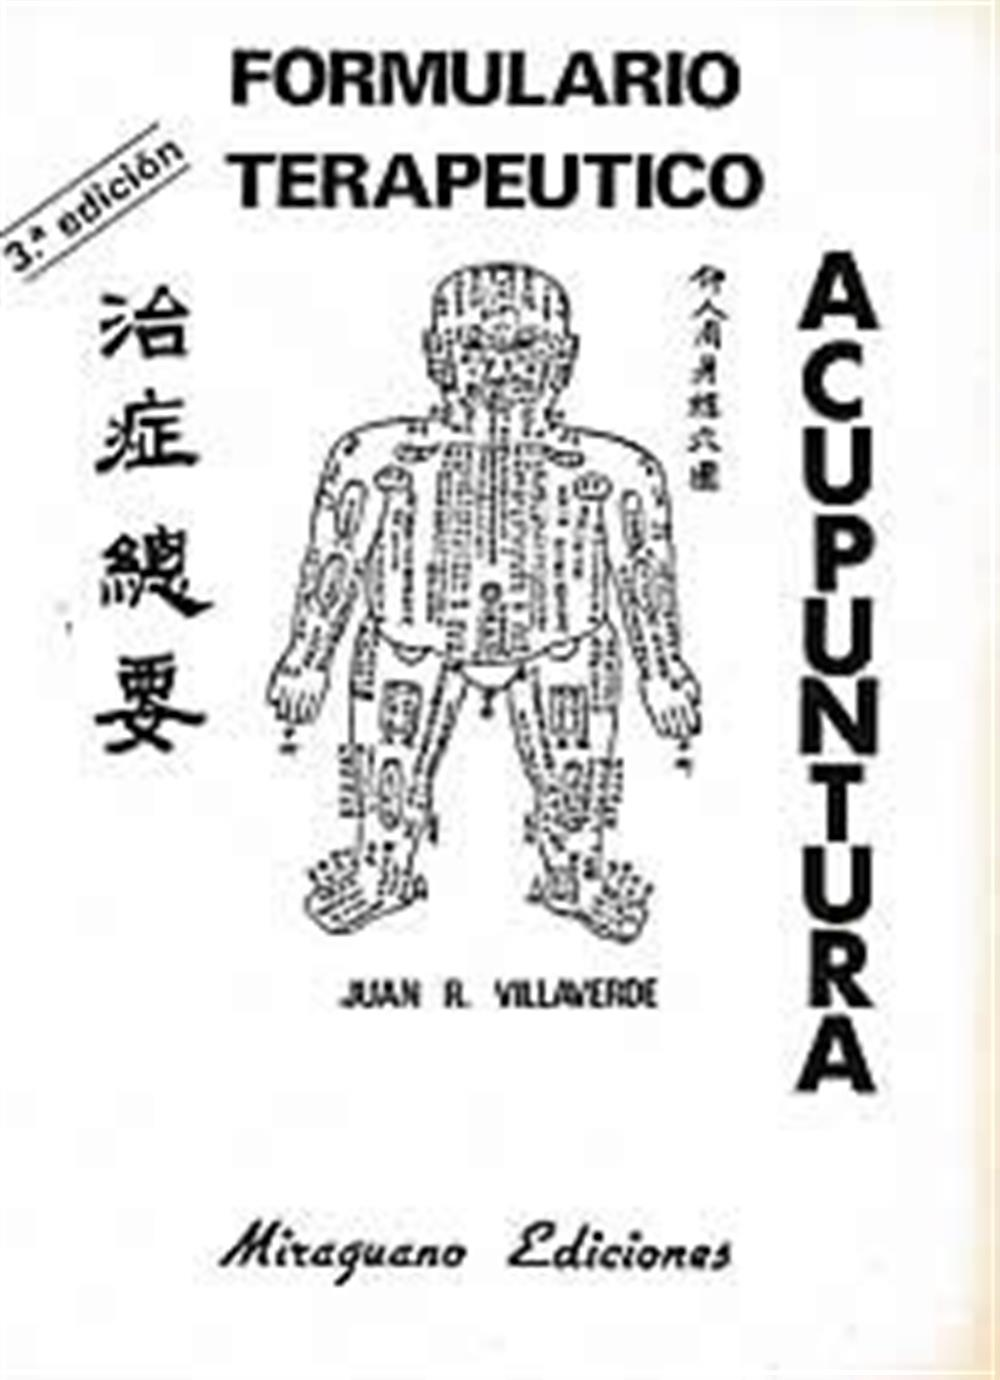 Formulario Terapeutico  de acupuntura